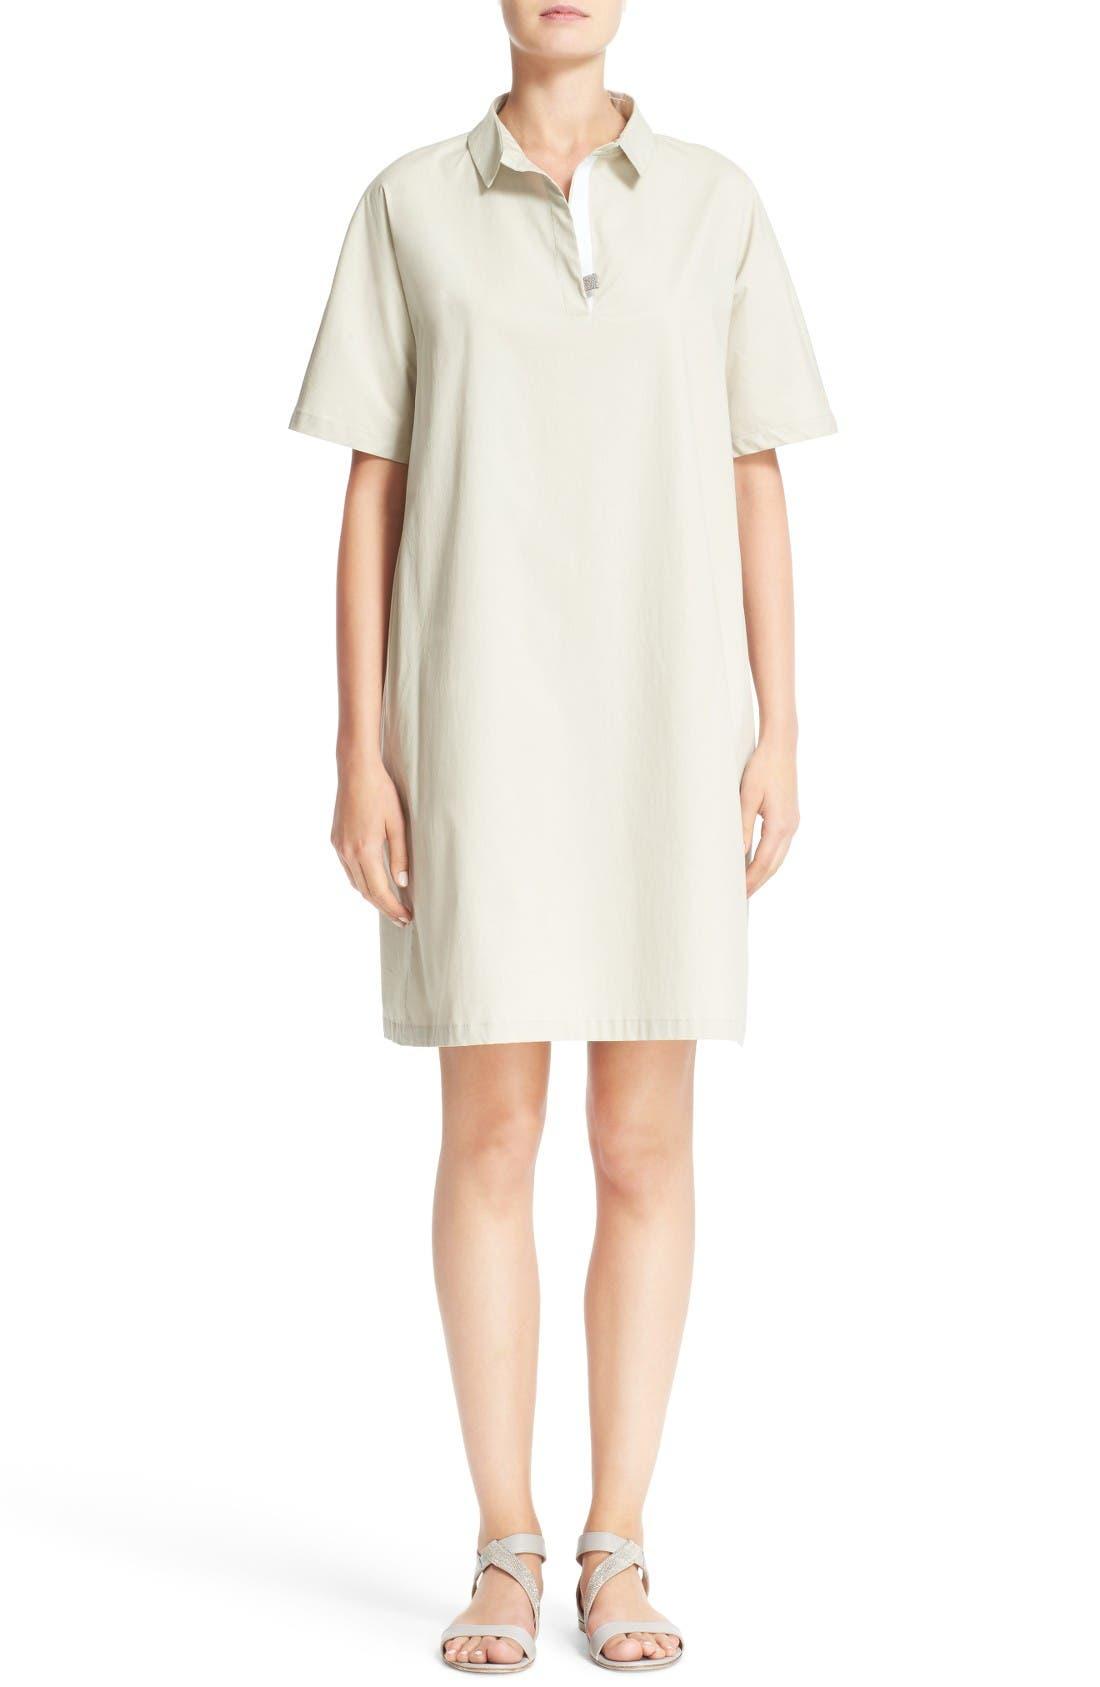 Alternate Image 1 Selected - Fabiana Filippi Grosgrain Trim Shirtdress